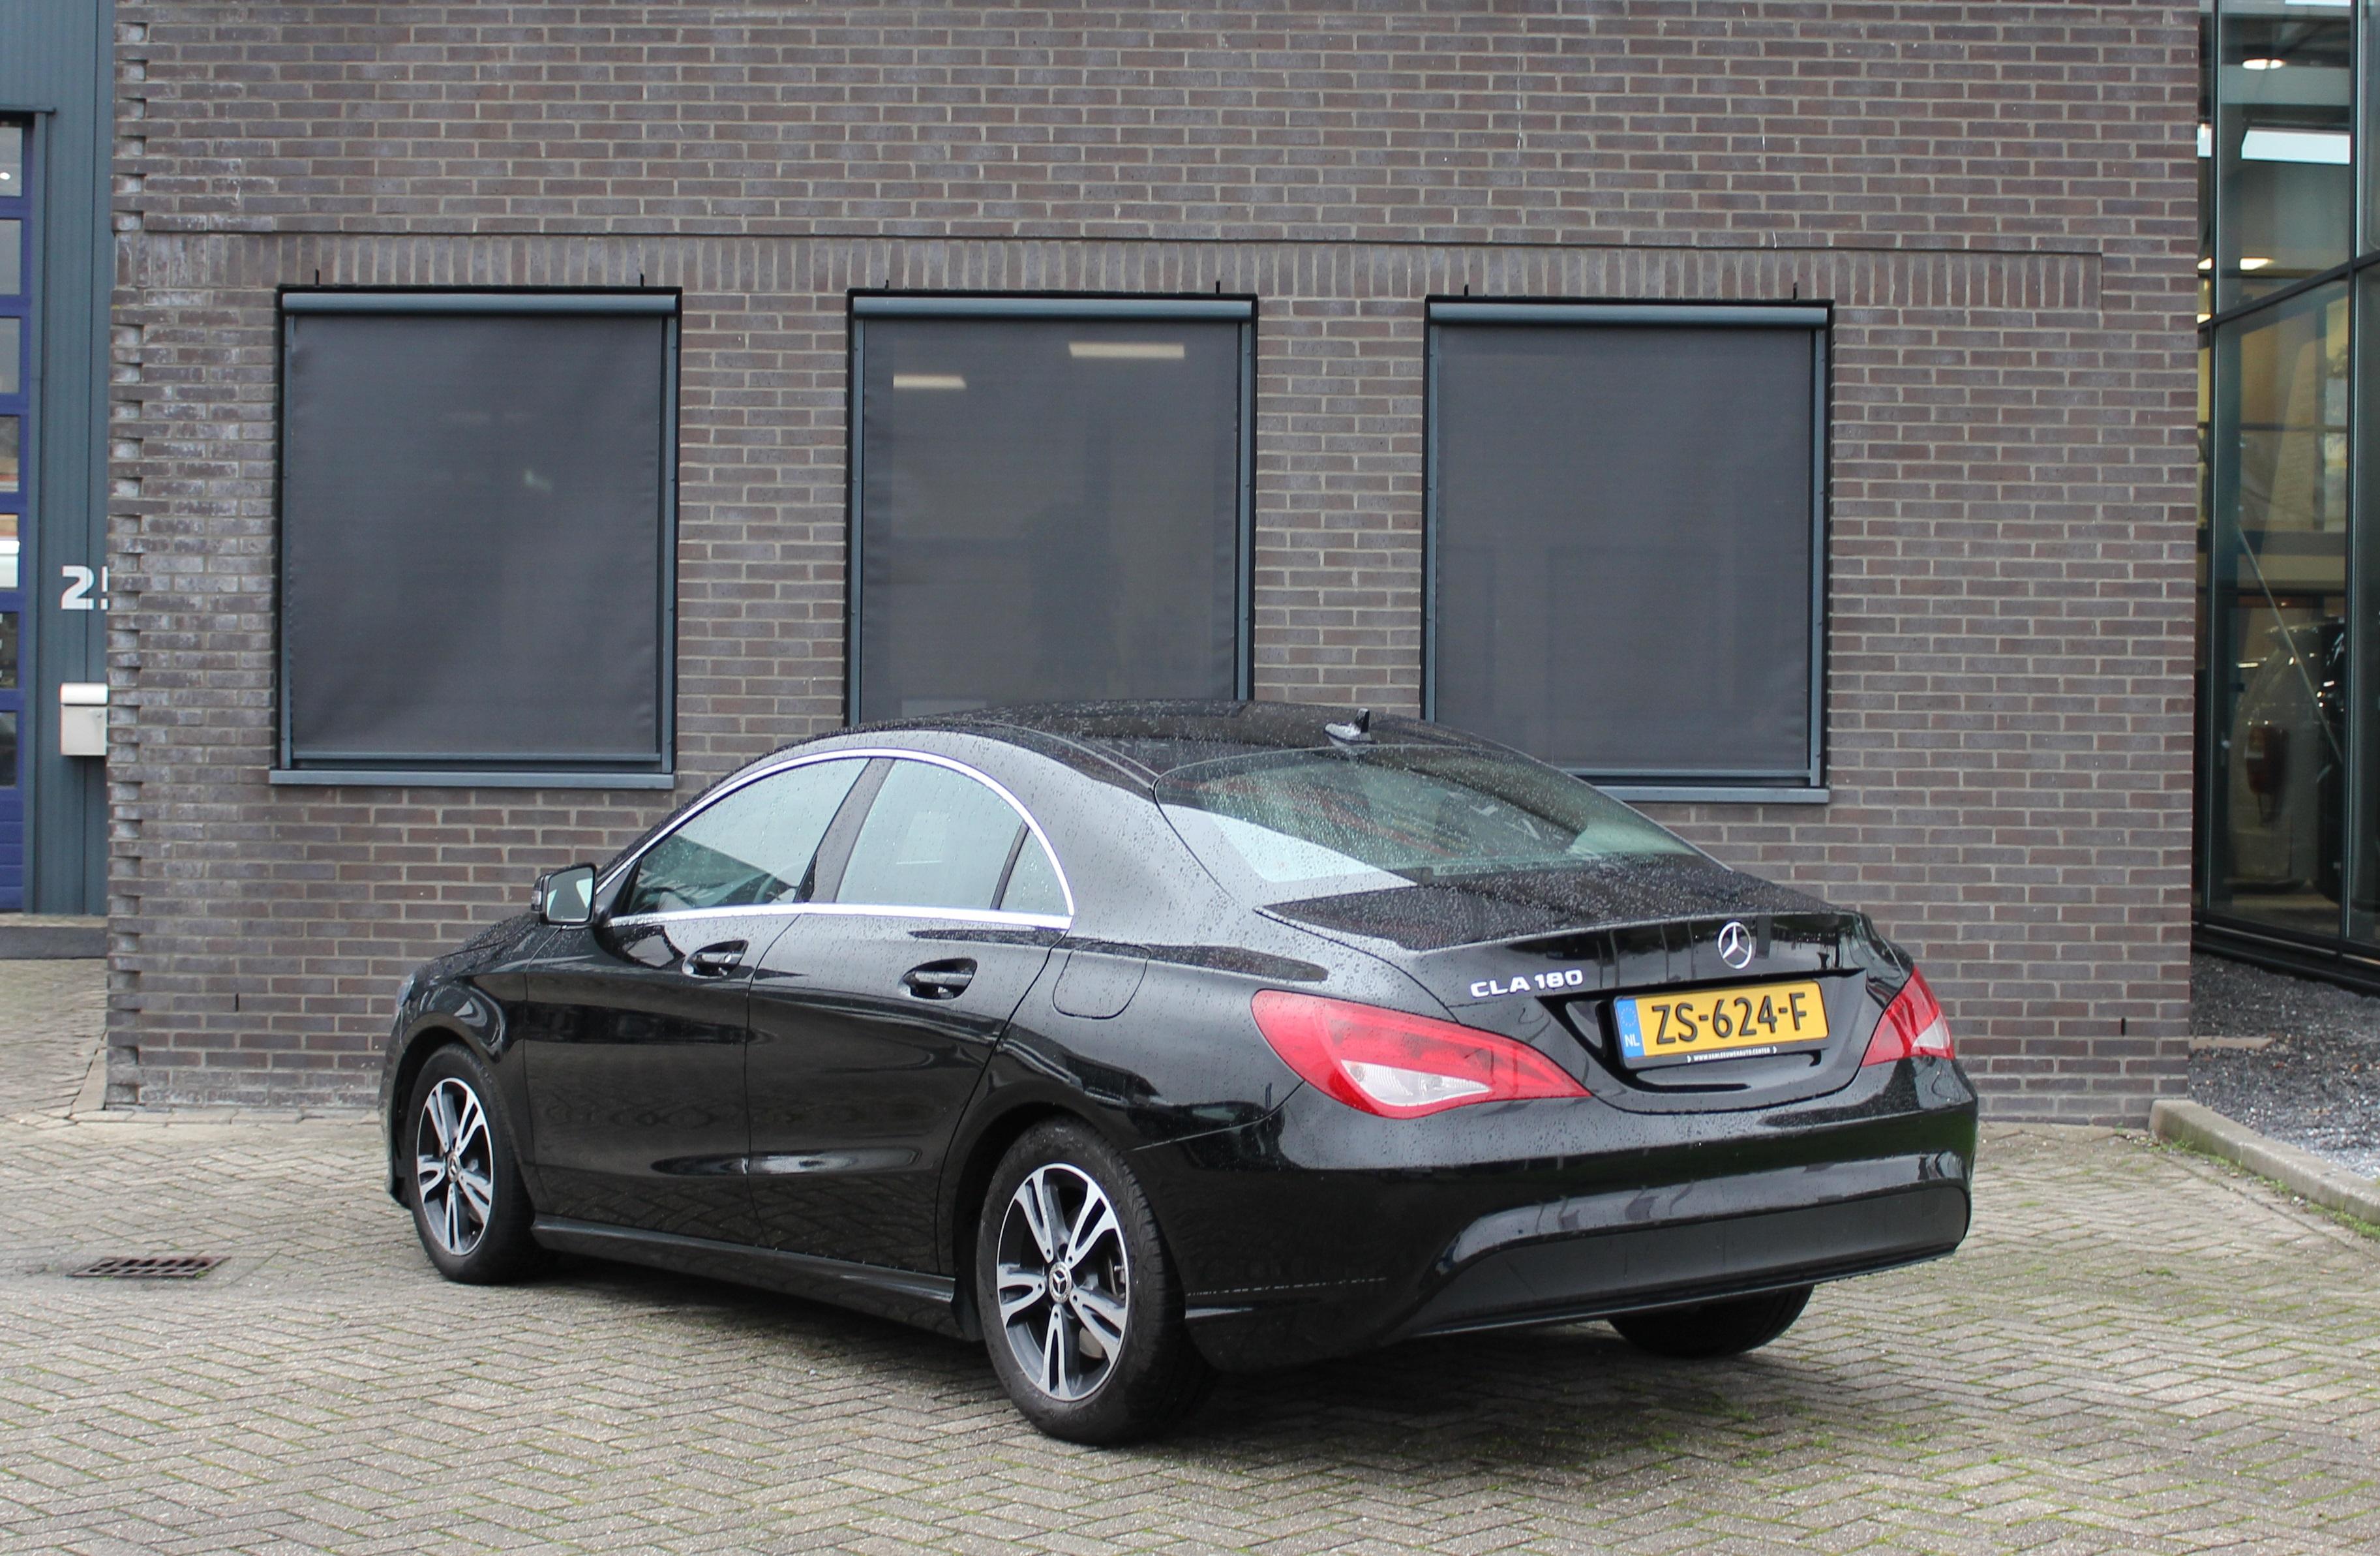 Mercedes Benz zwart achterzijde